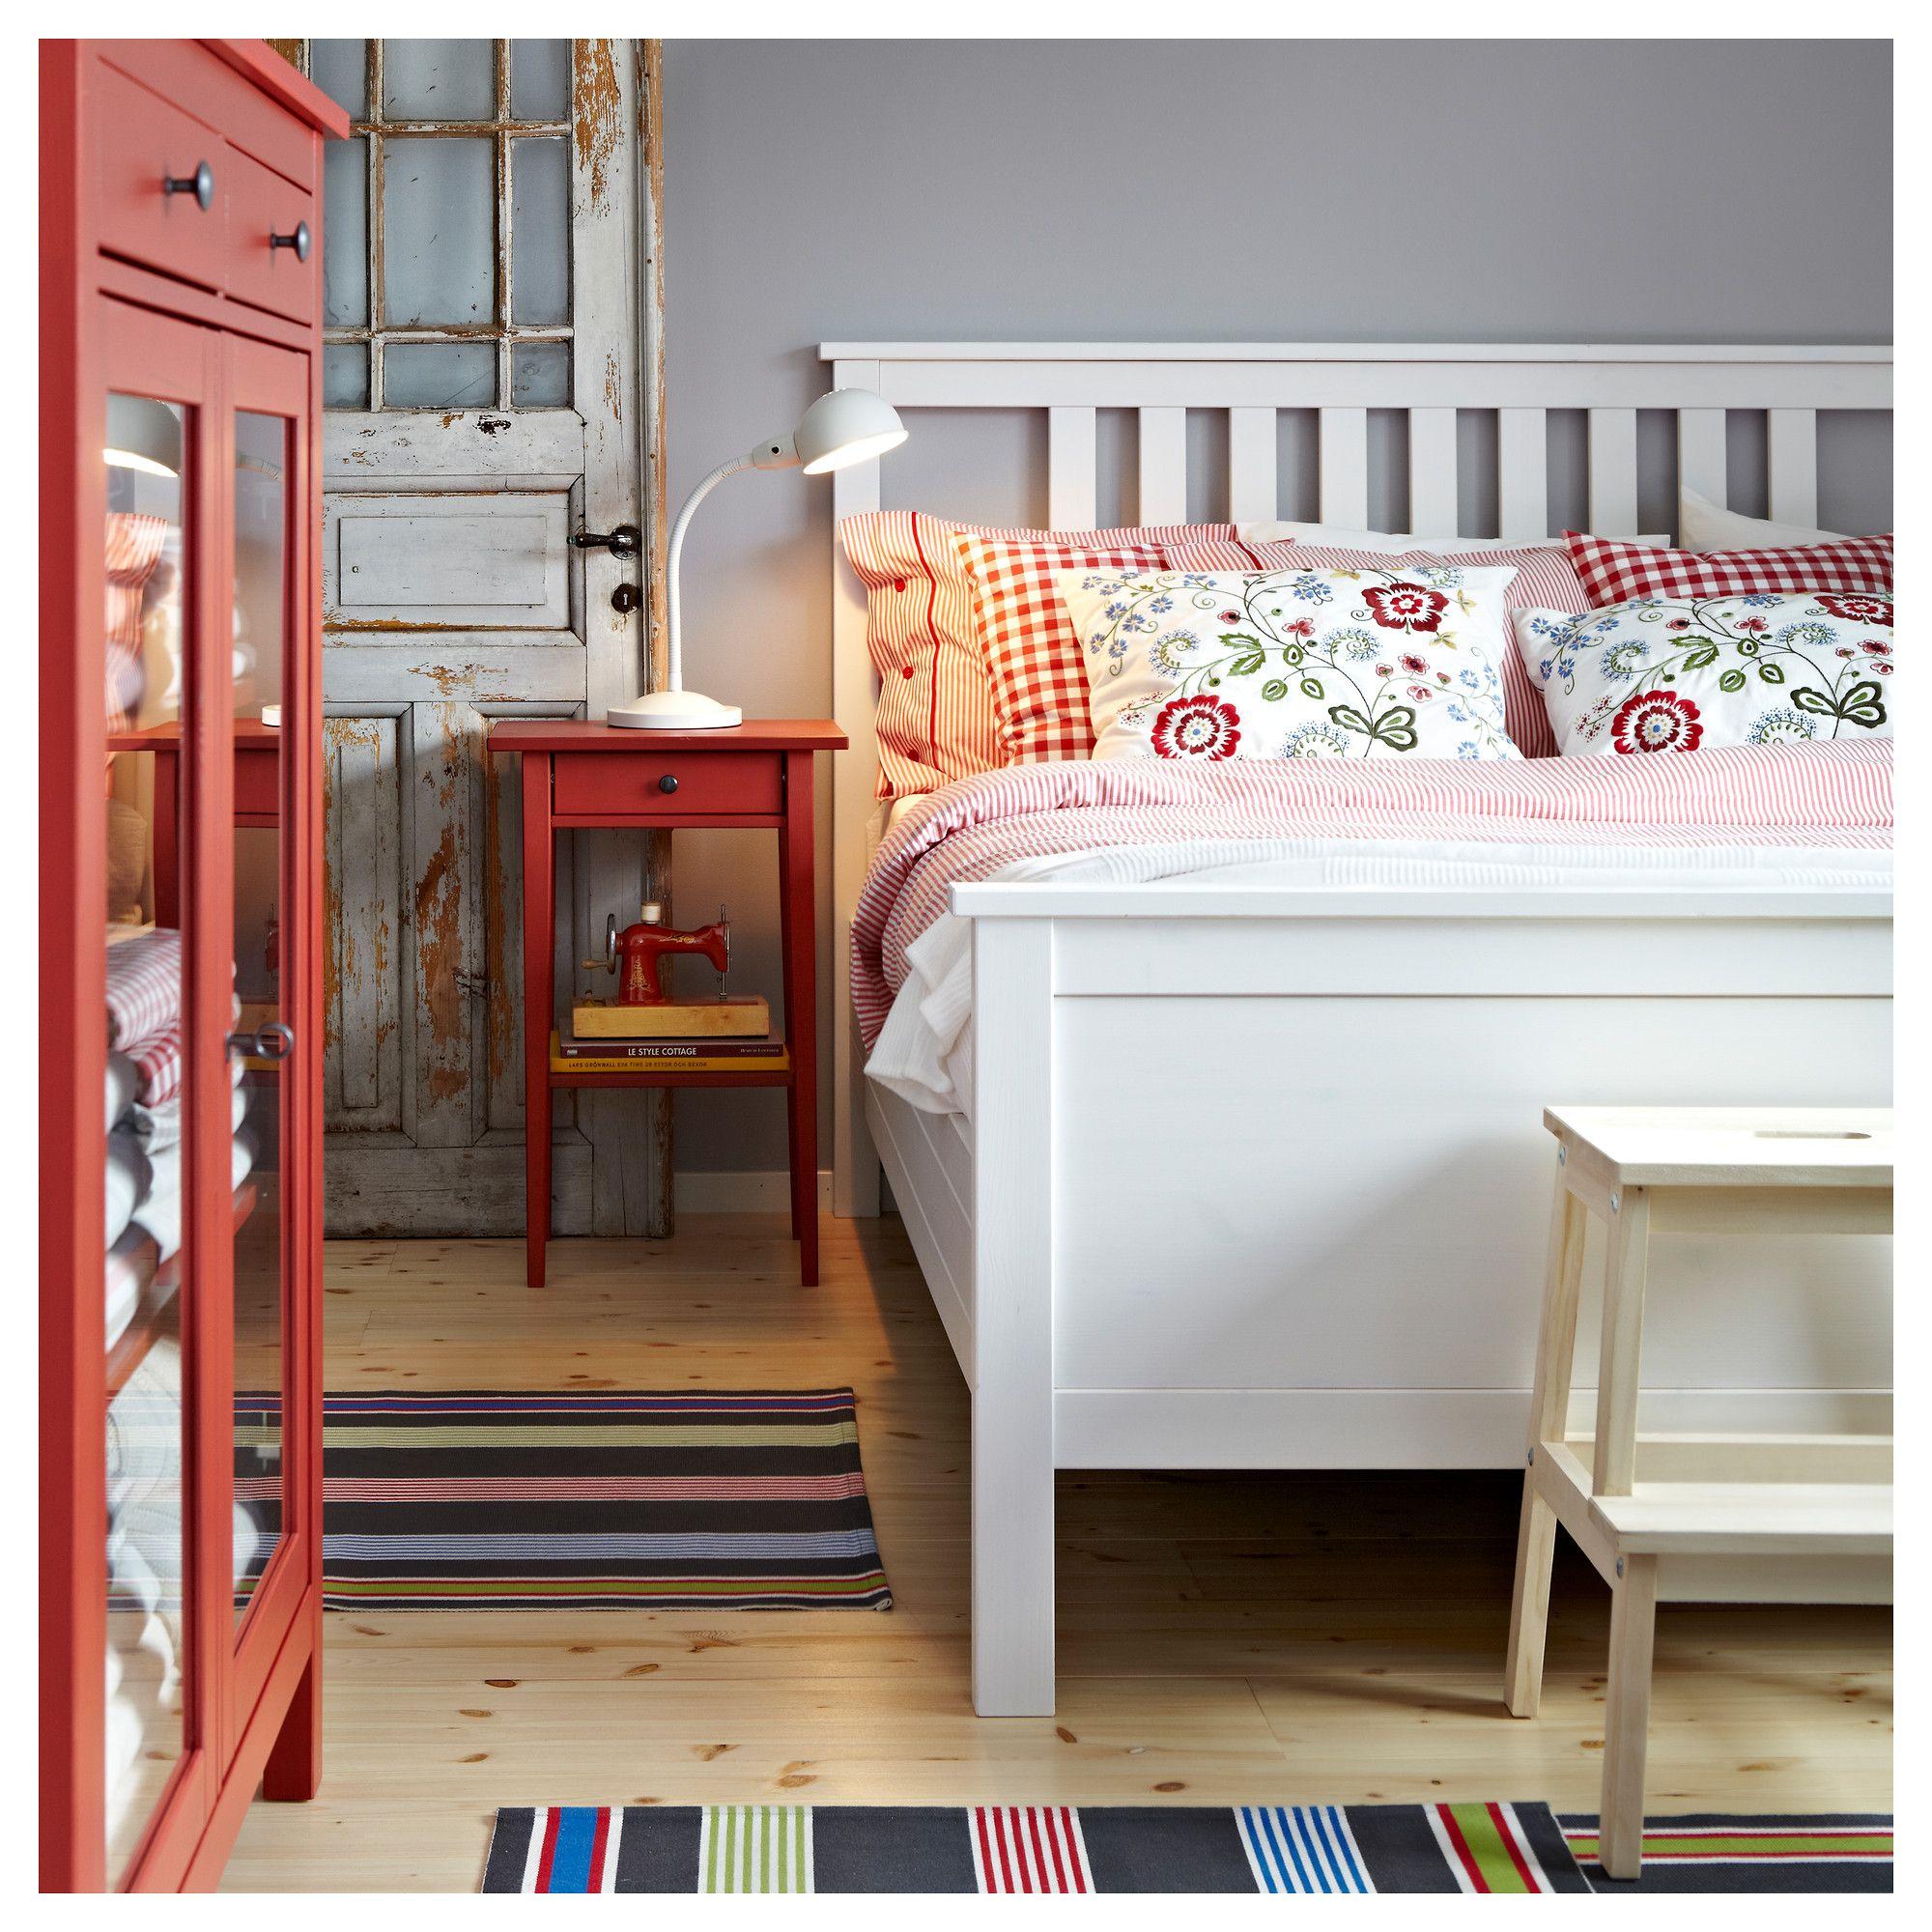 HEMNES Nightstand - red - IKEA | Home ideas | Pinterest | HEMNES ...